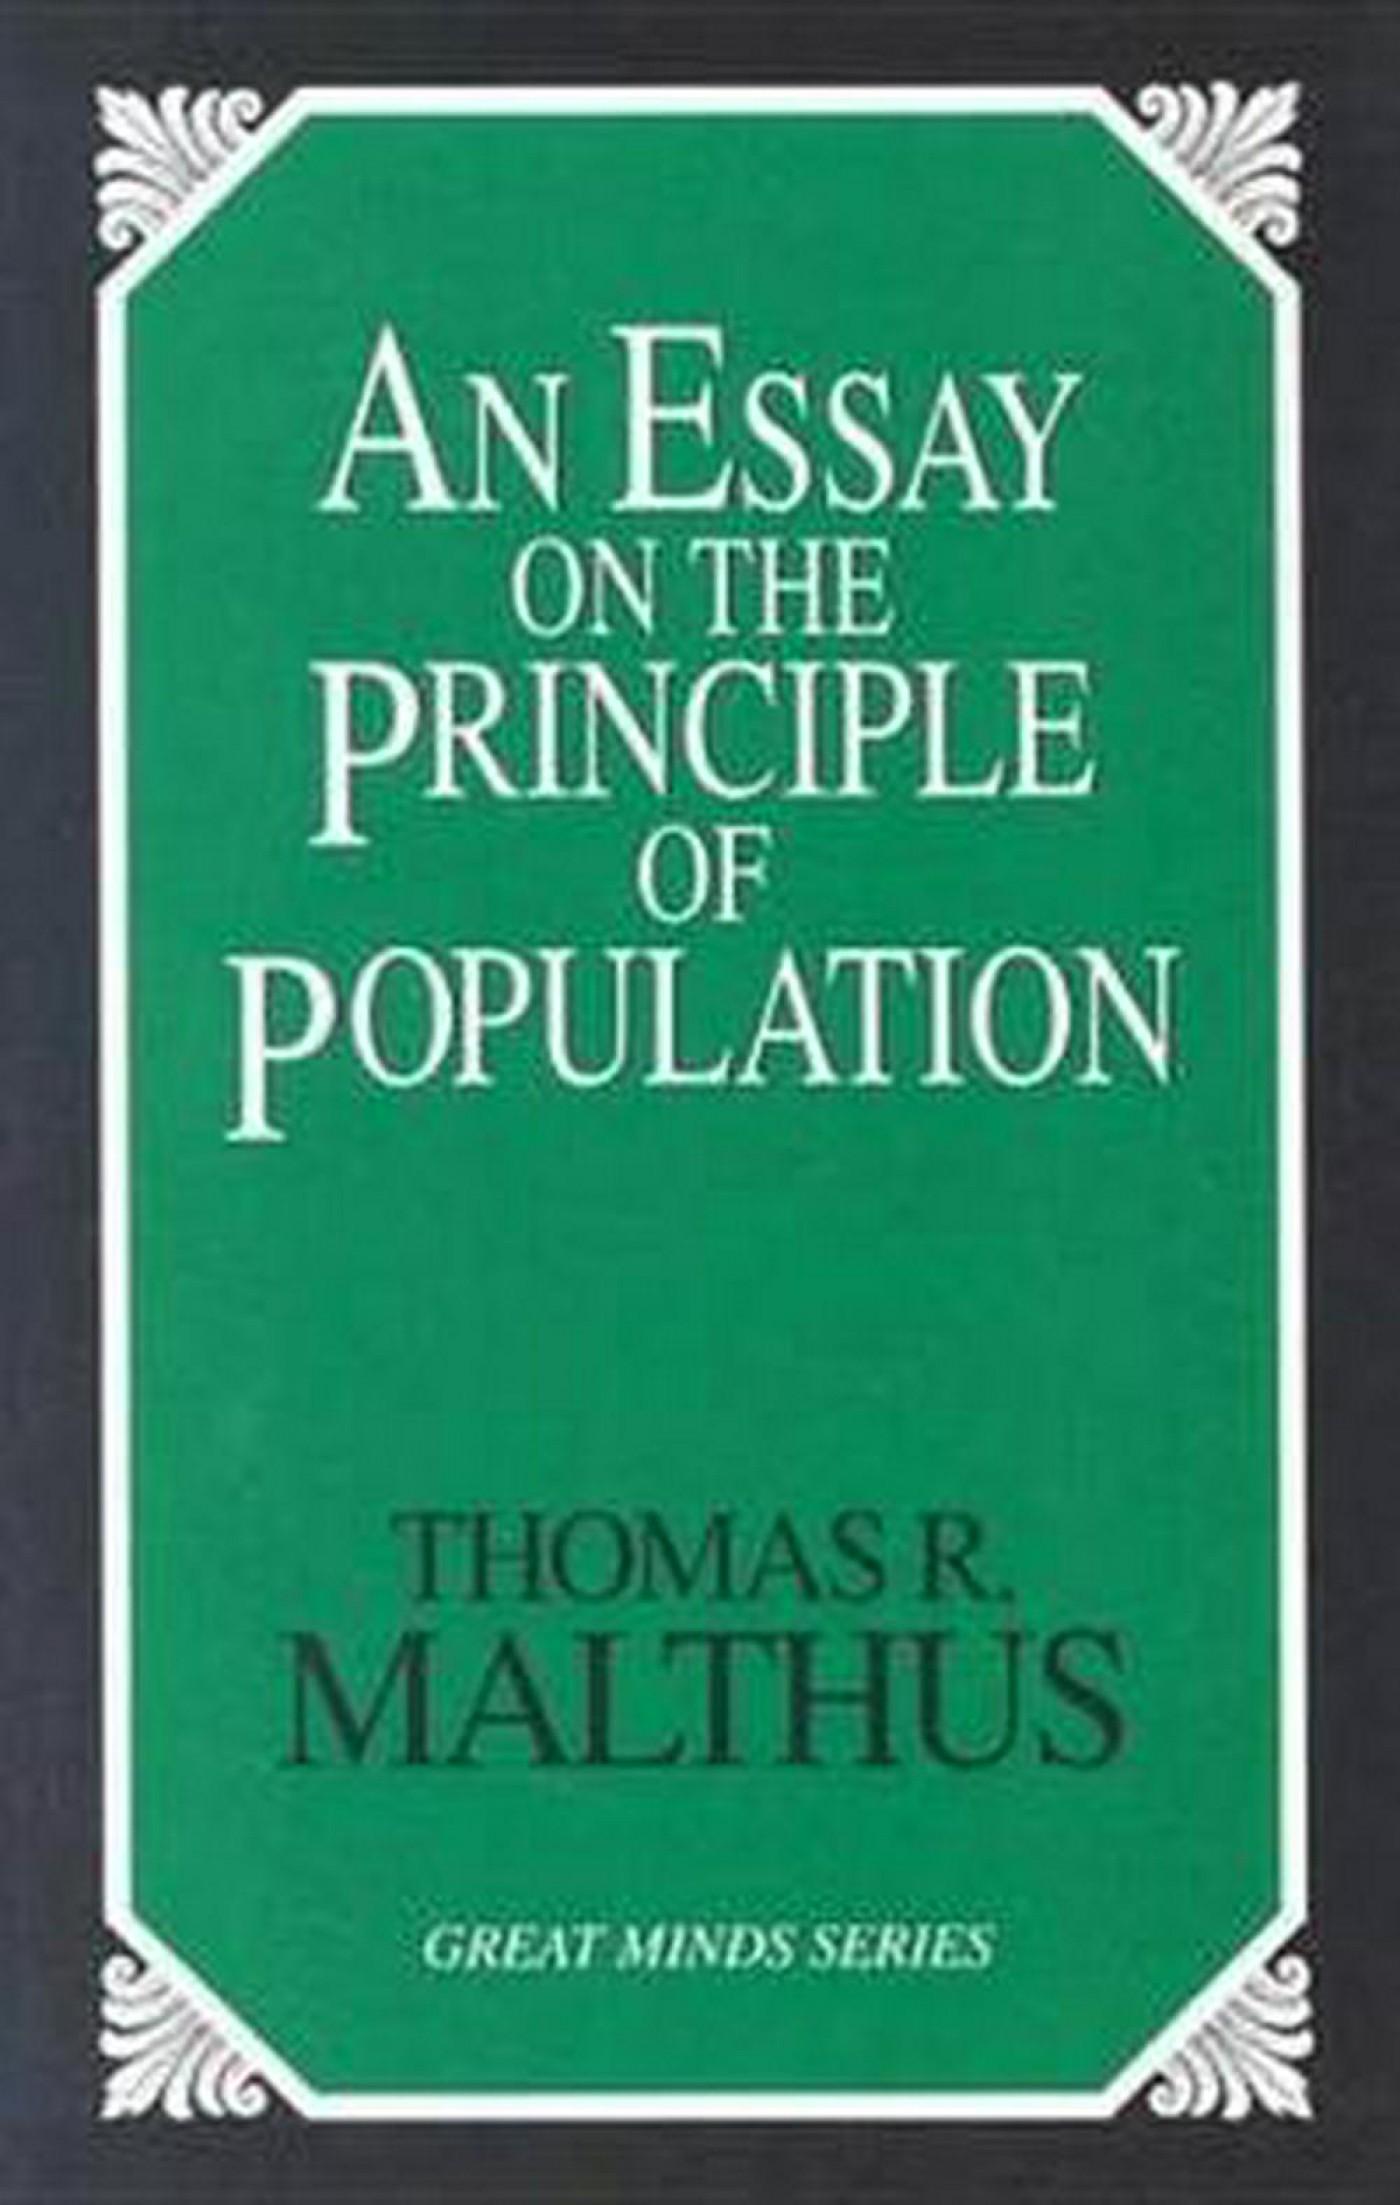 023 Essay Example On The Principle Of Population Singular Malthus Sparknotes Thomas Main Idea 1400